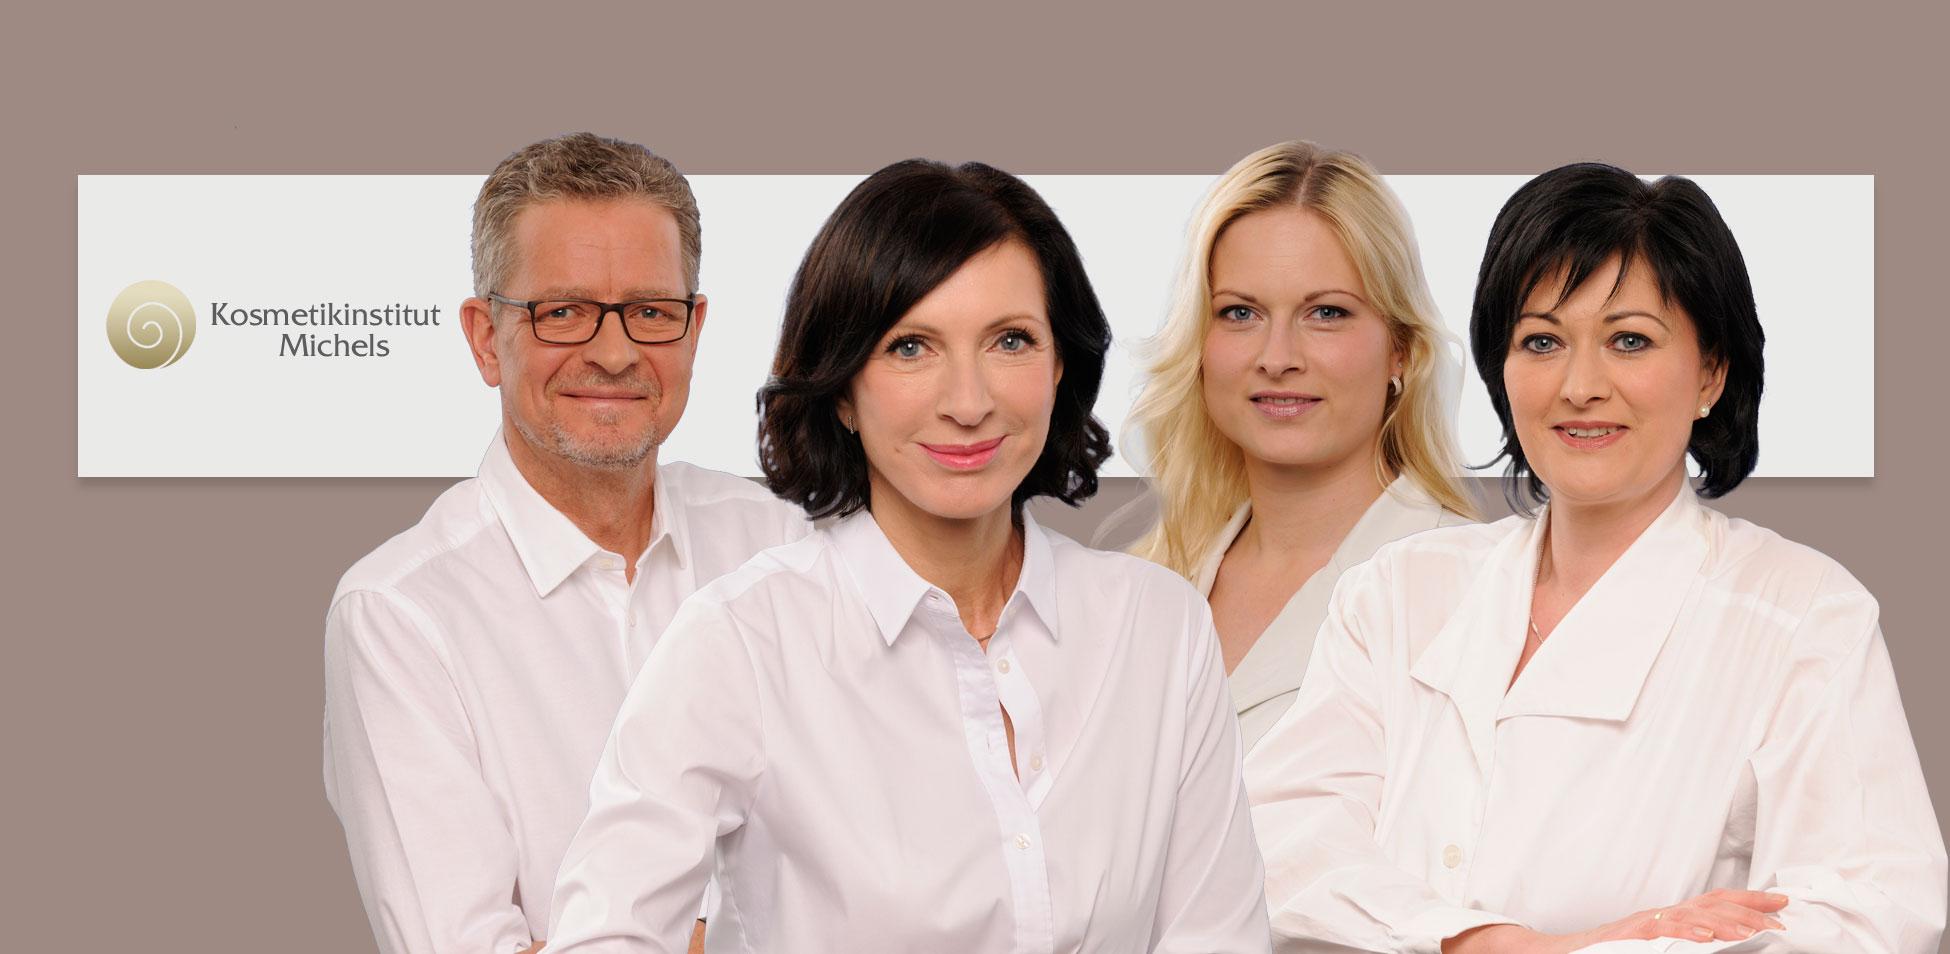 Kosmetikinstitut Michels